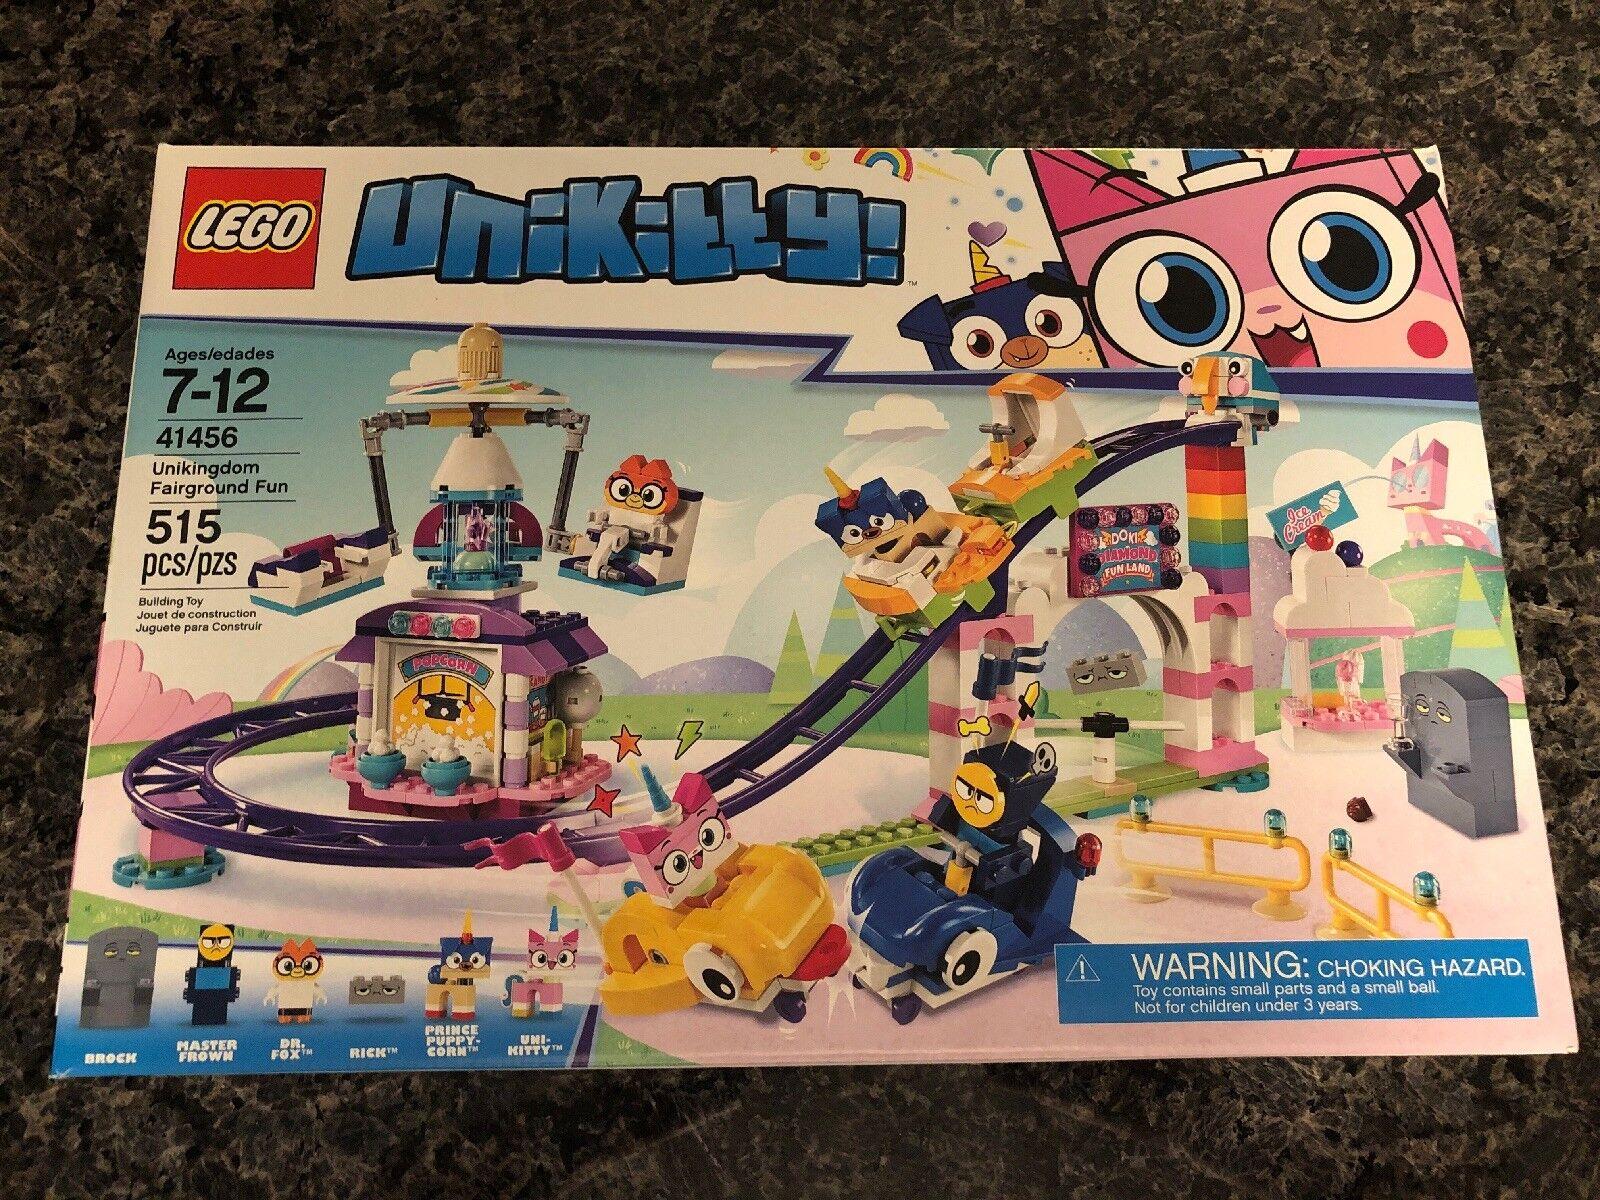 LEGO Unikitty Unikingdom Fairground Fun 41456 Christmas Gift Girls Boys Boys Boys 558a52